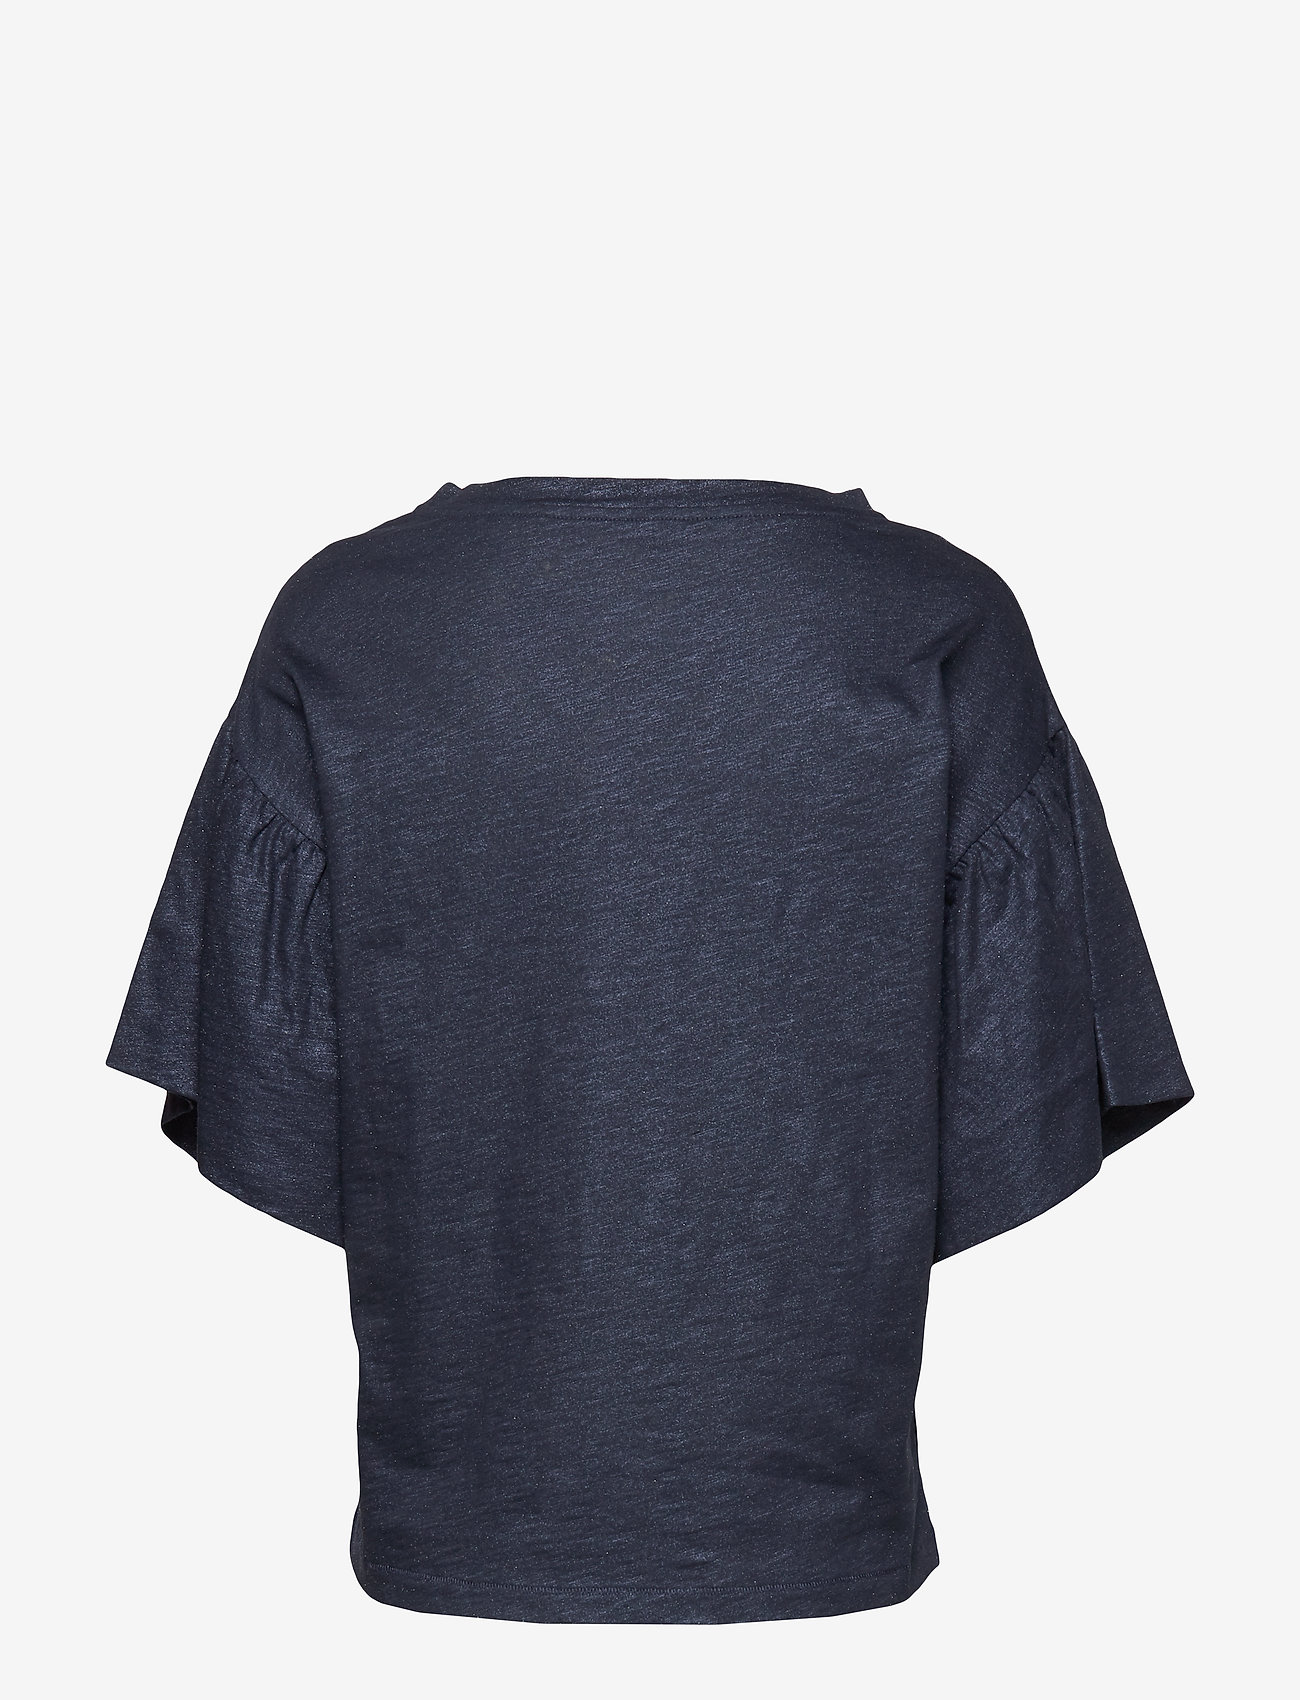 Day Birger et Mikkelsen - Day Again - t-shirts - navy blazer - 1